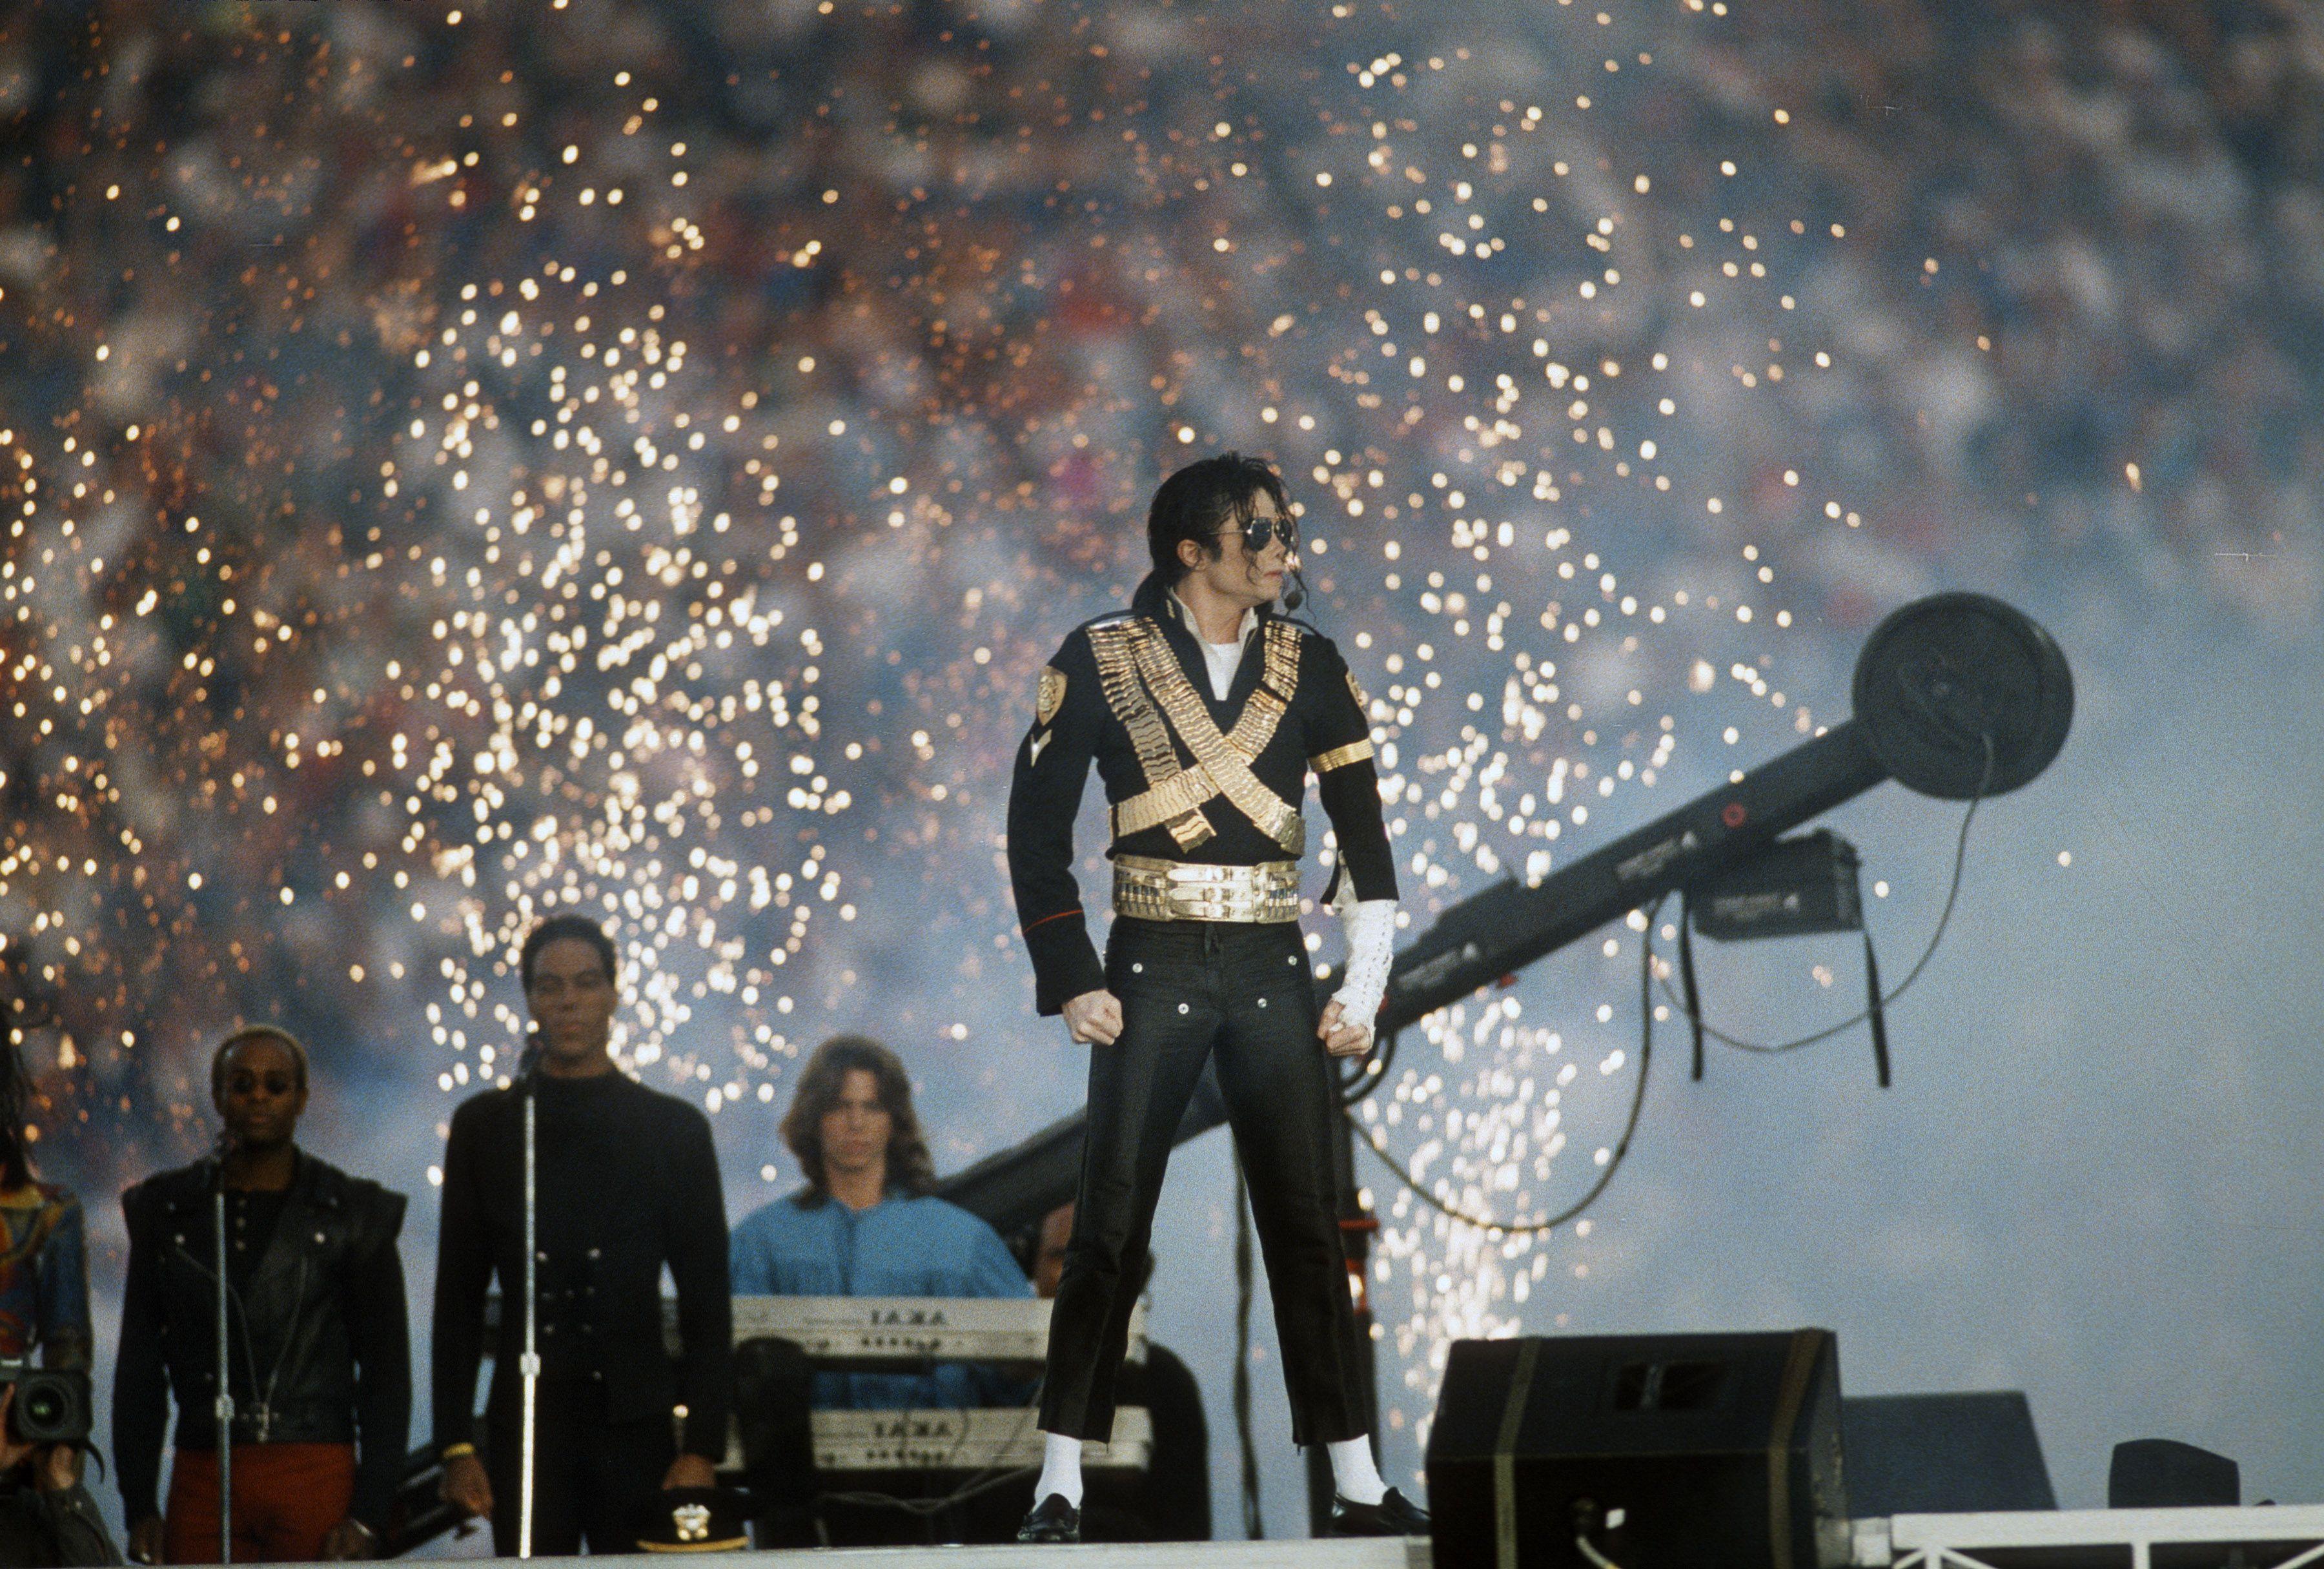 Super Bowl XXVII: MJ Makes Television History (1993)